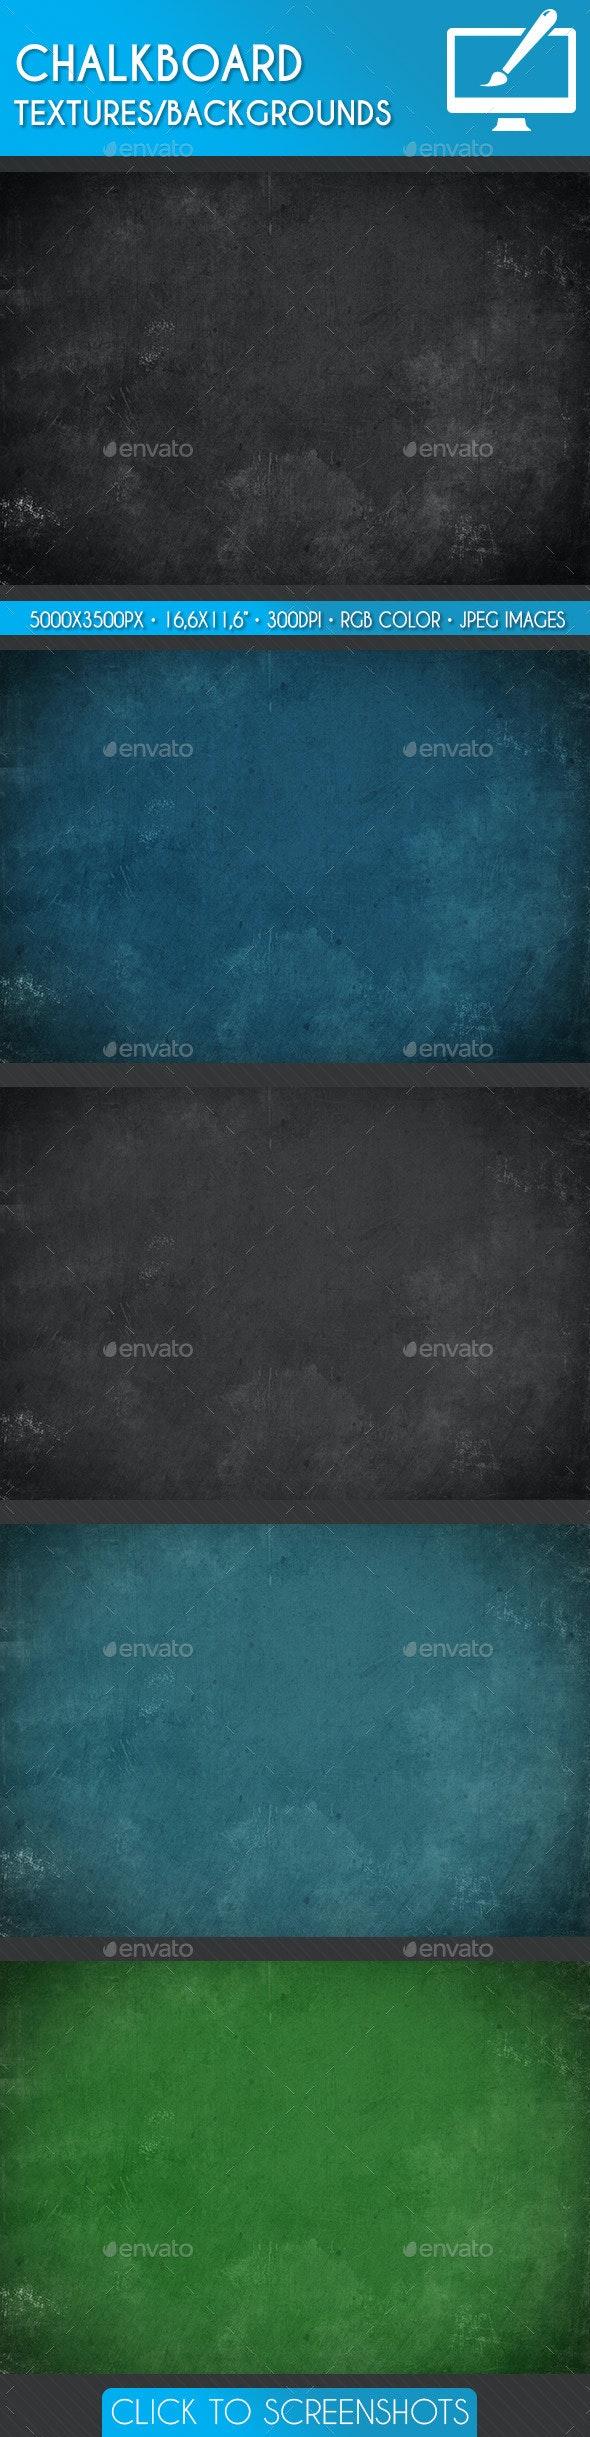 Chalkboard Textures/Backgrounds - Miscellaneous Textures